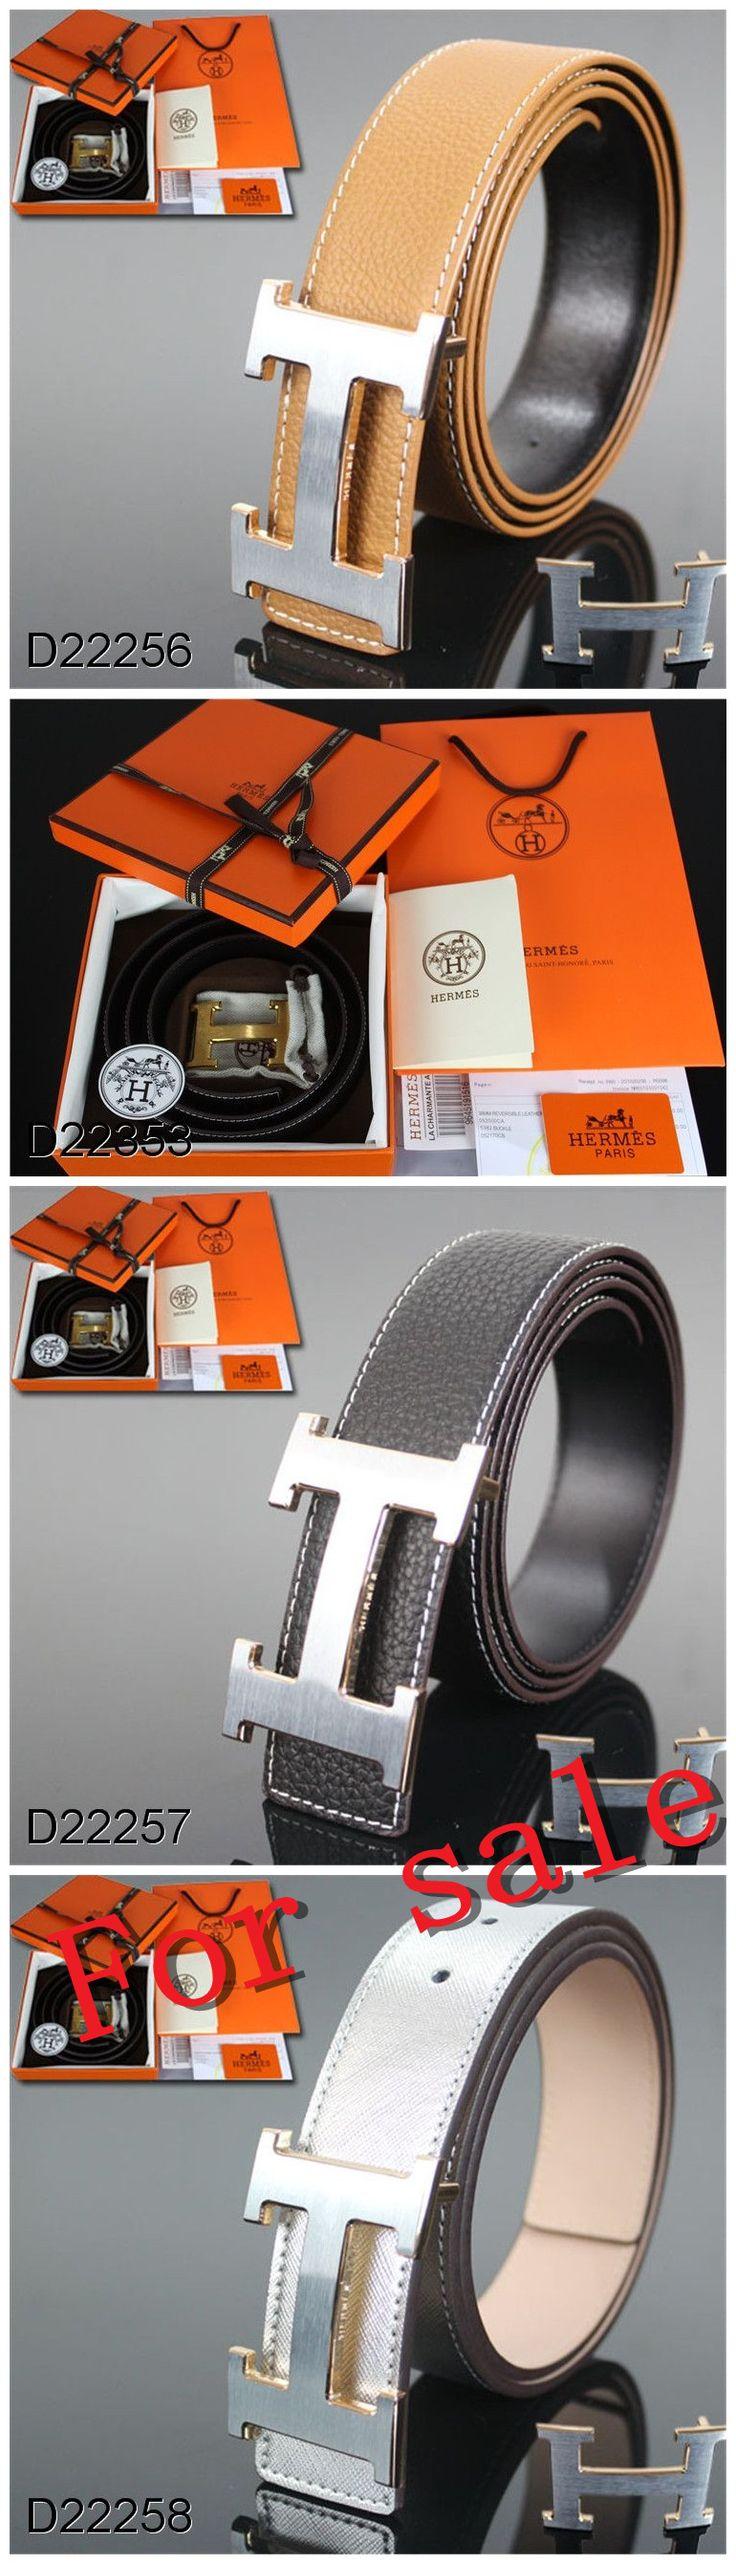 Online belt shop